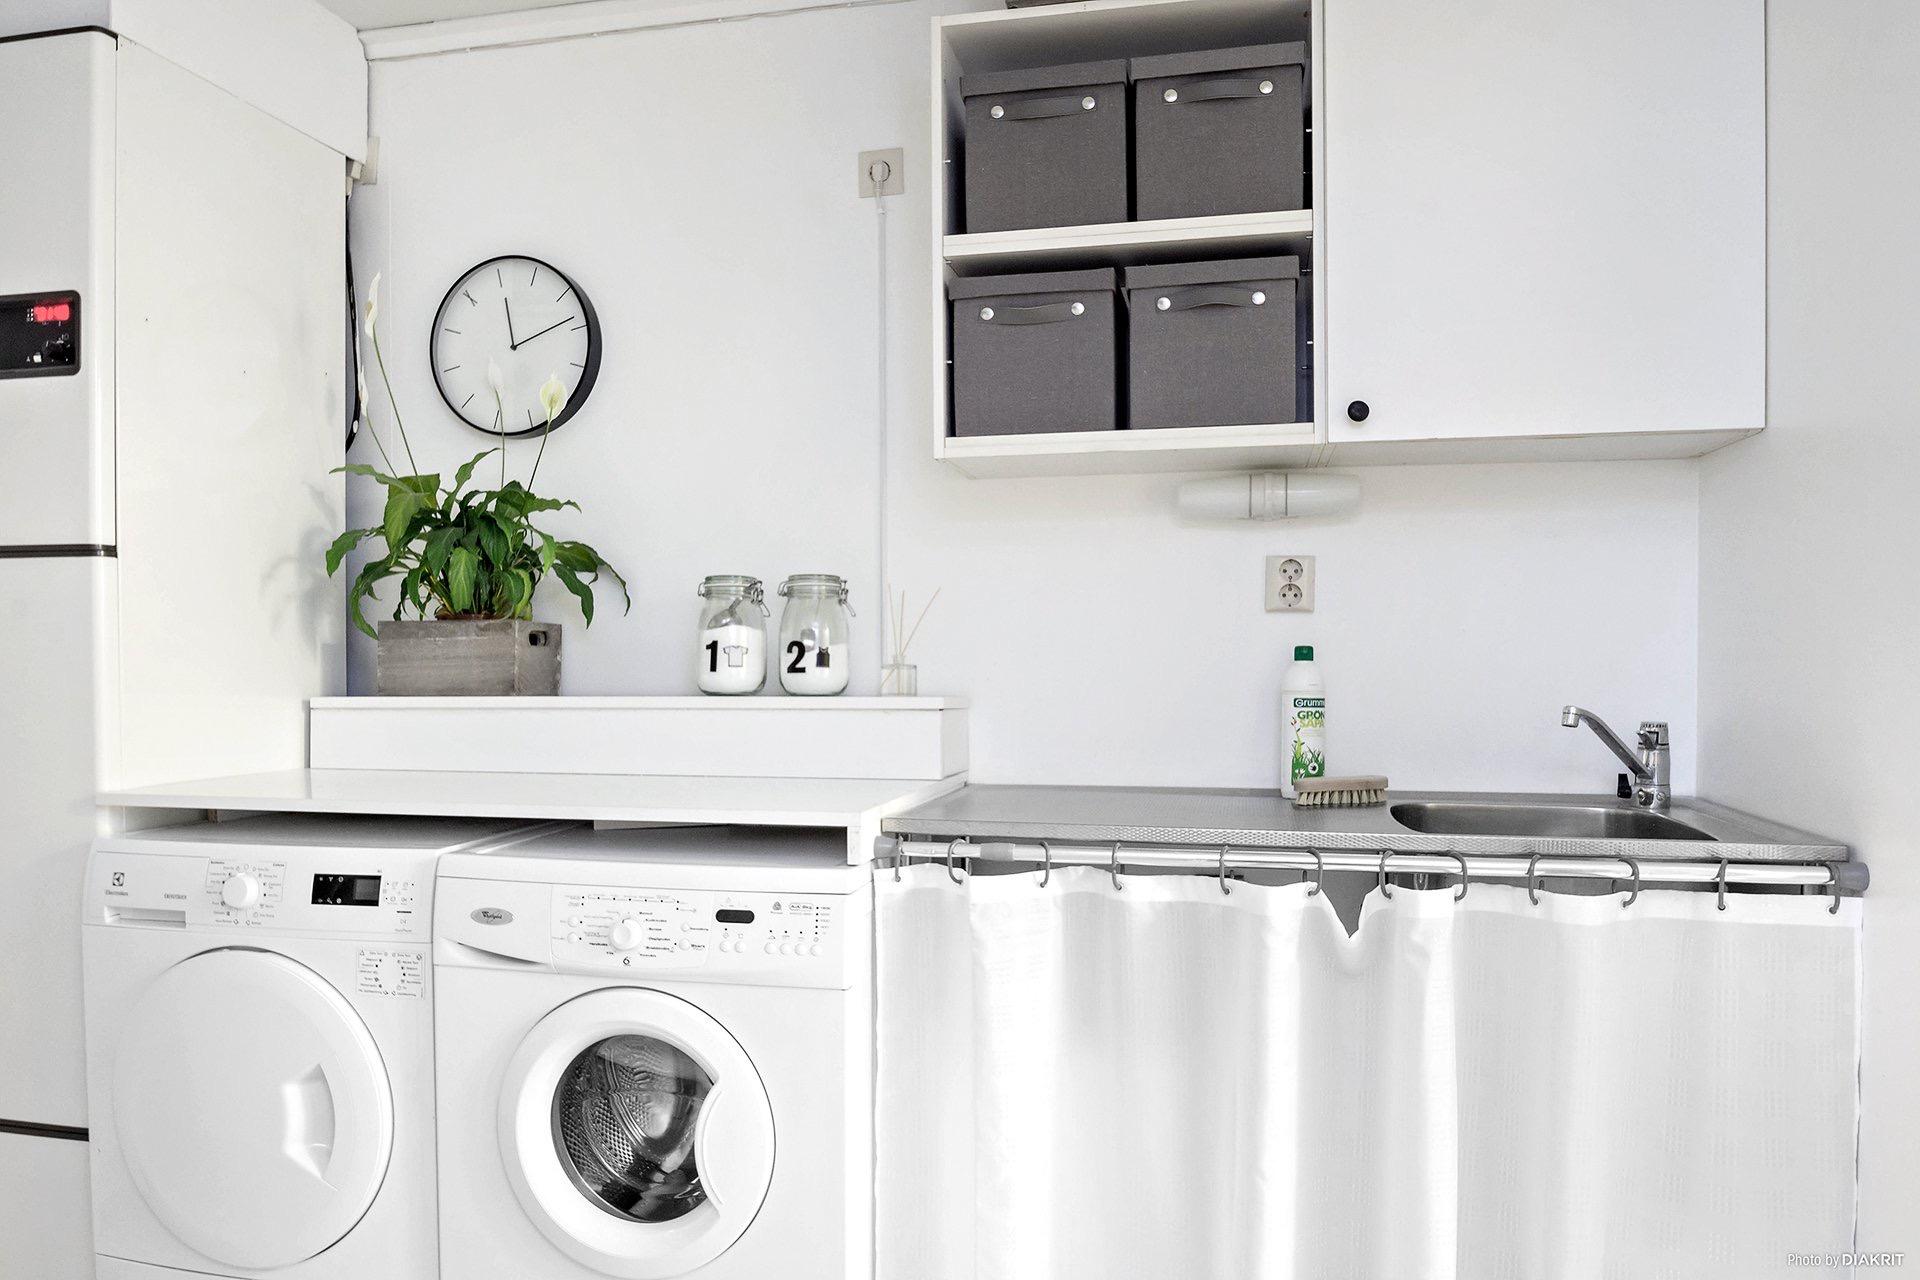 домашняя прачечная стиральная сушильная машина